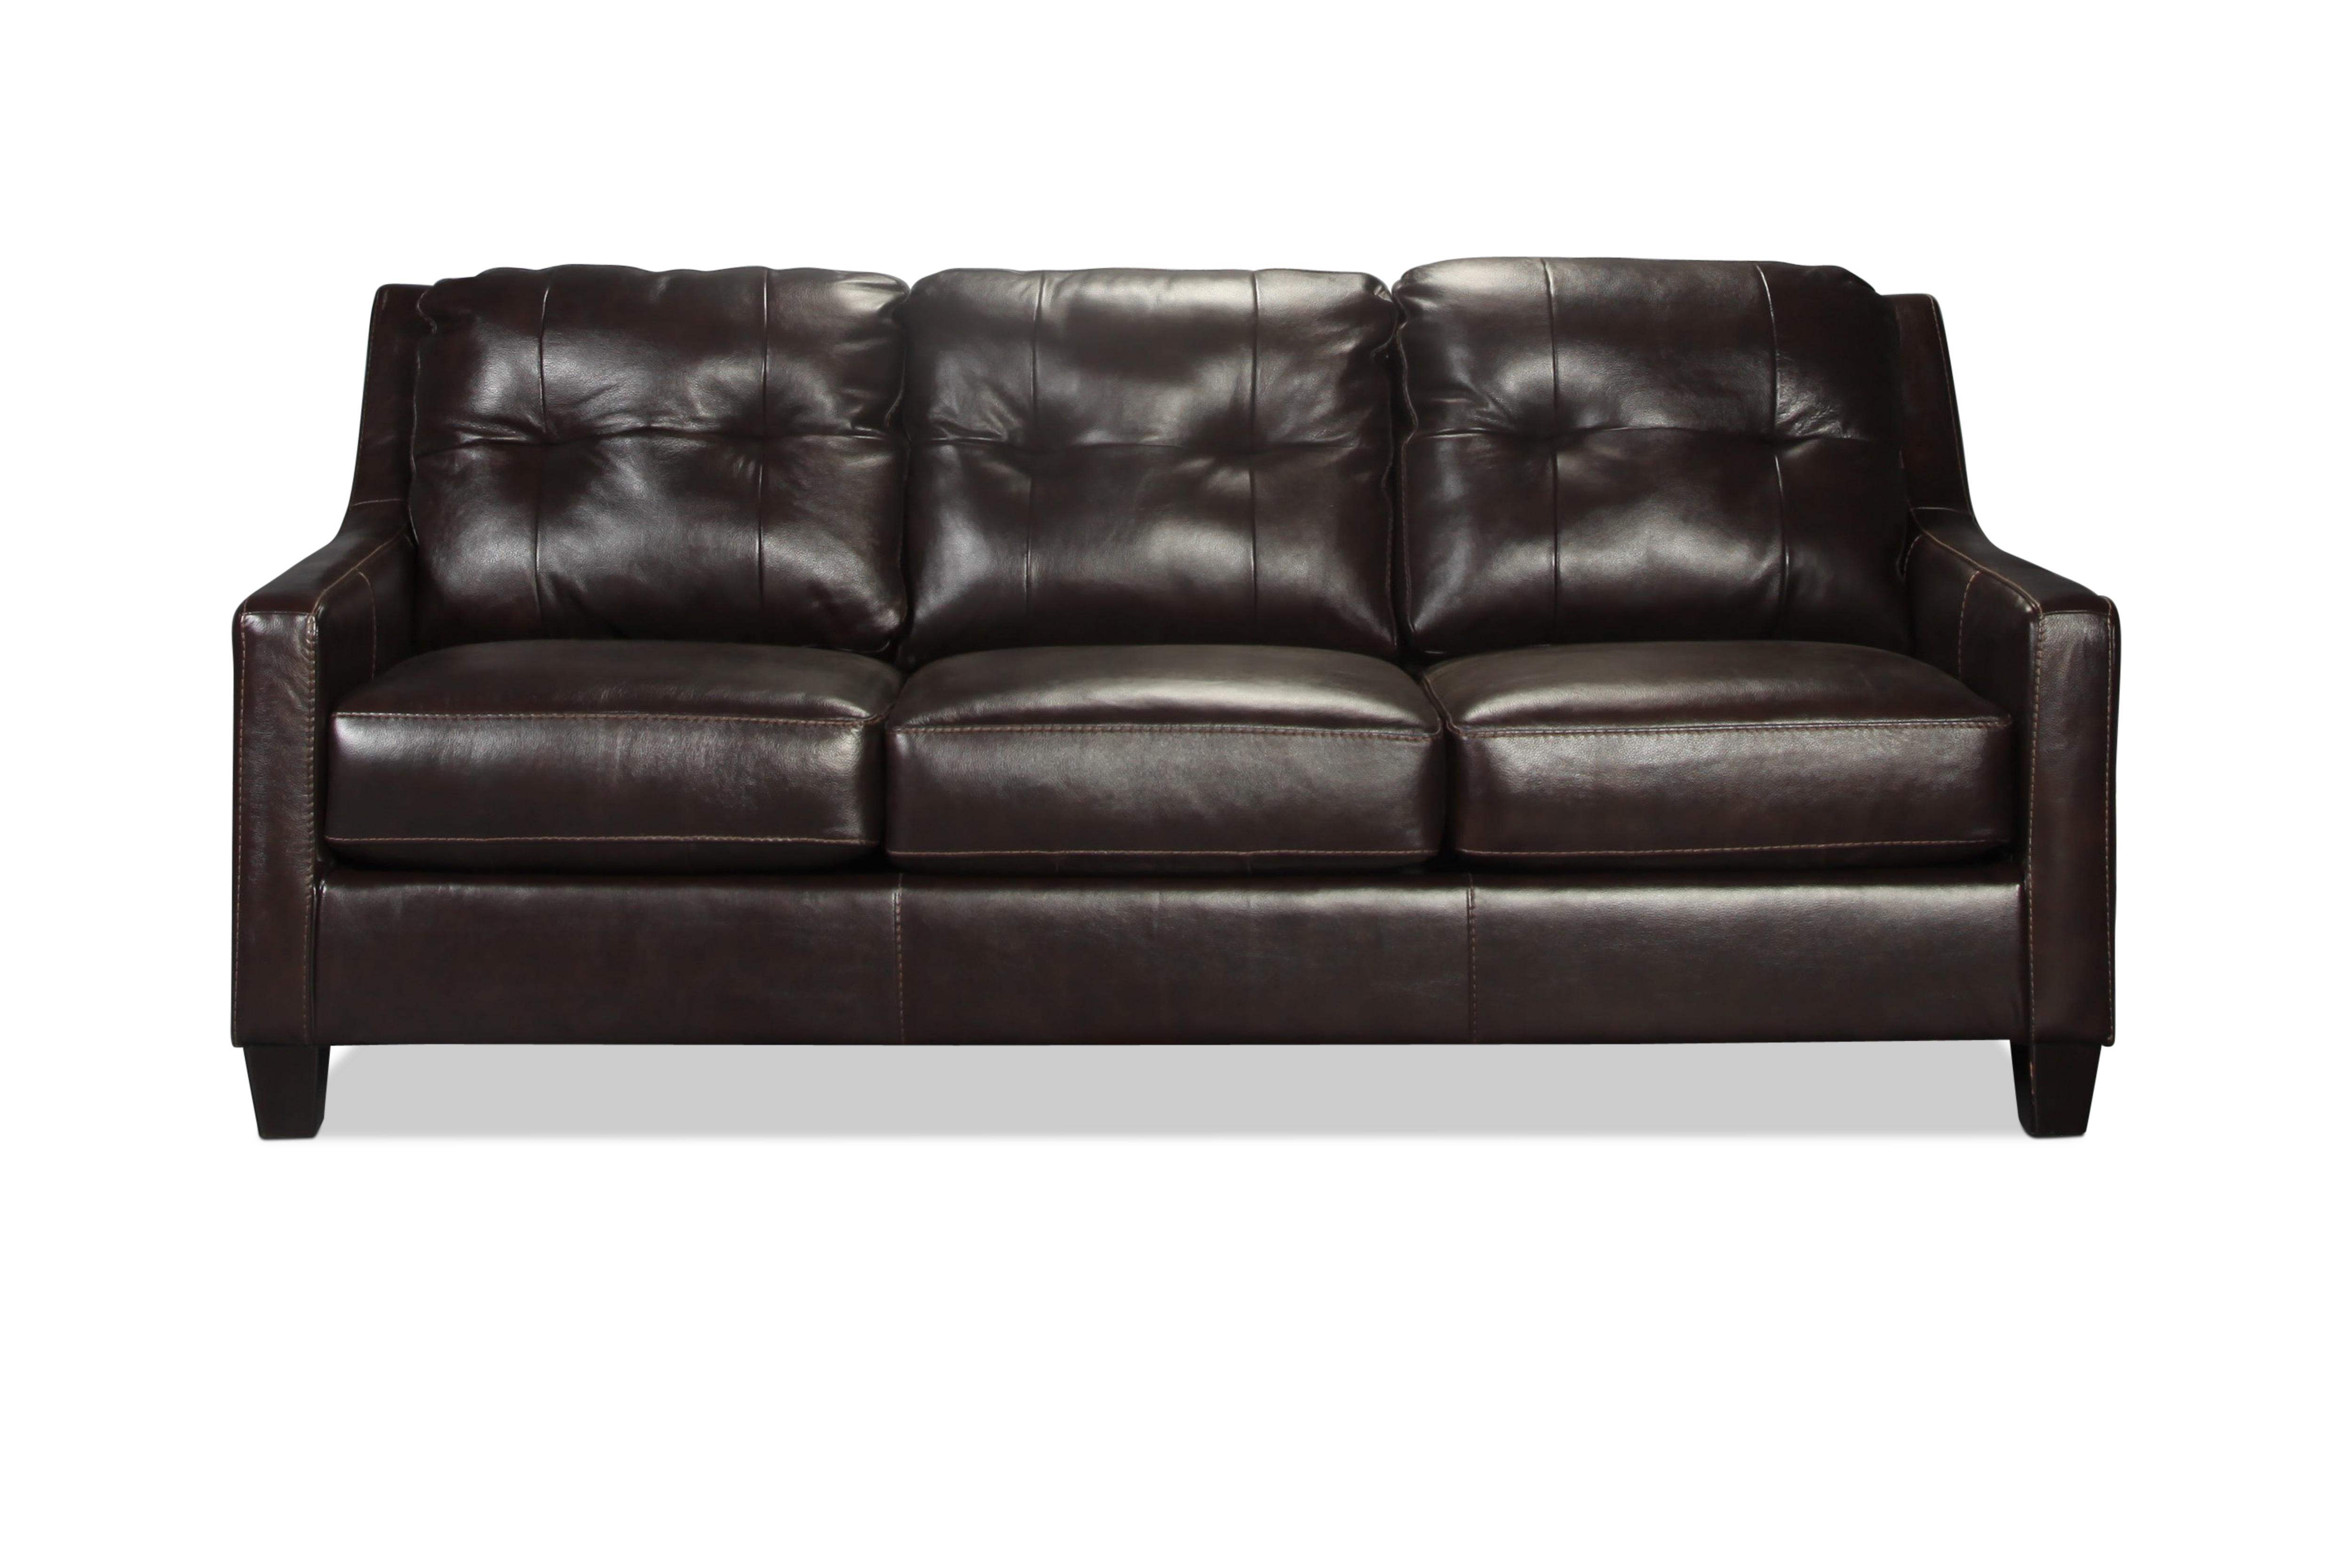 Brookings sofa mahogany levin furniture for Levin furniture sectional sofa